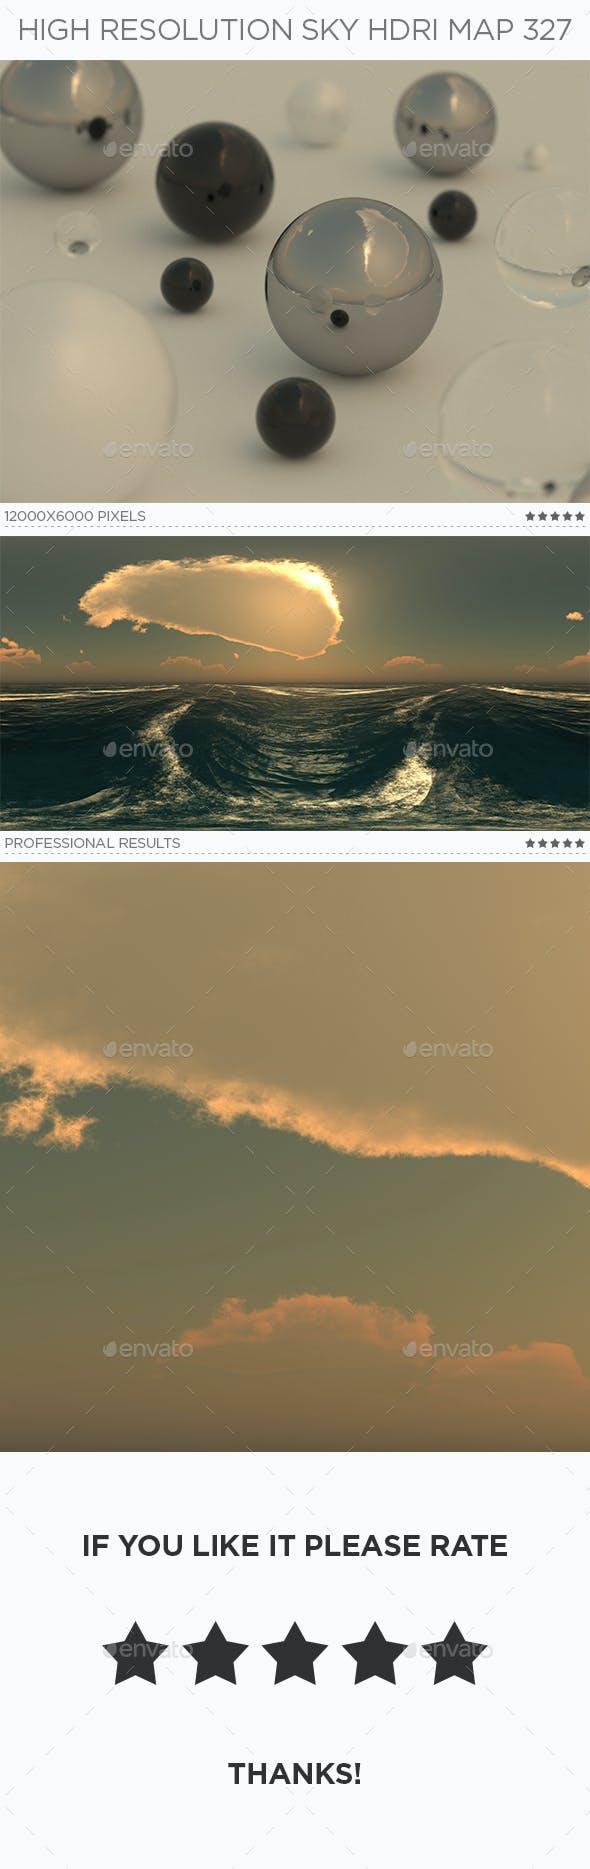 High Resolution Sky HDRi Map 327 - 3DOcean Item for Sale